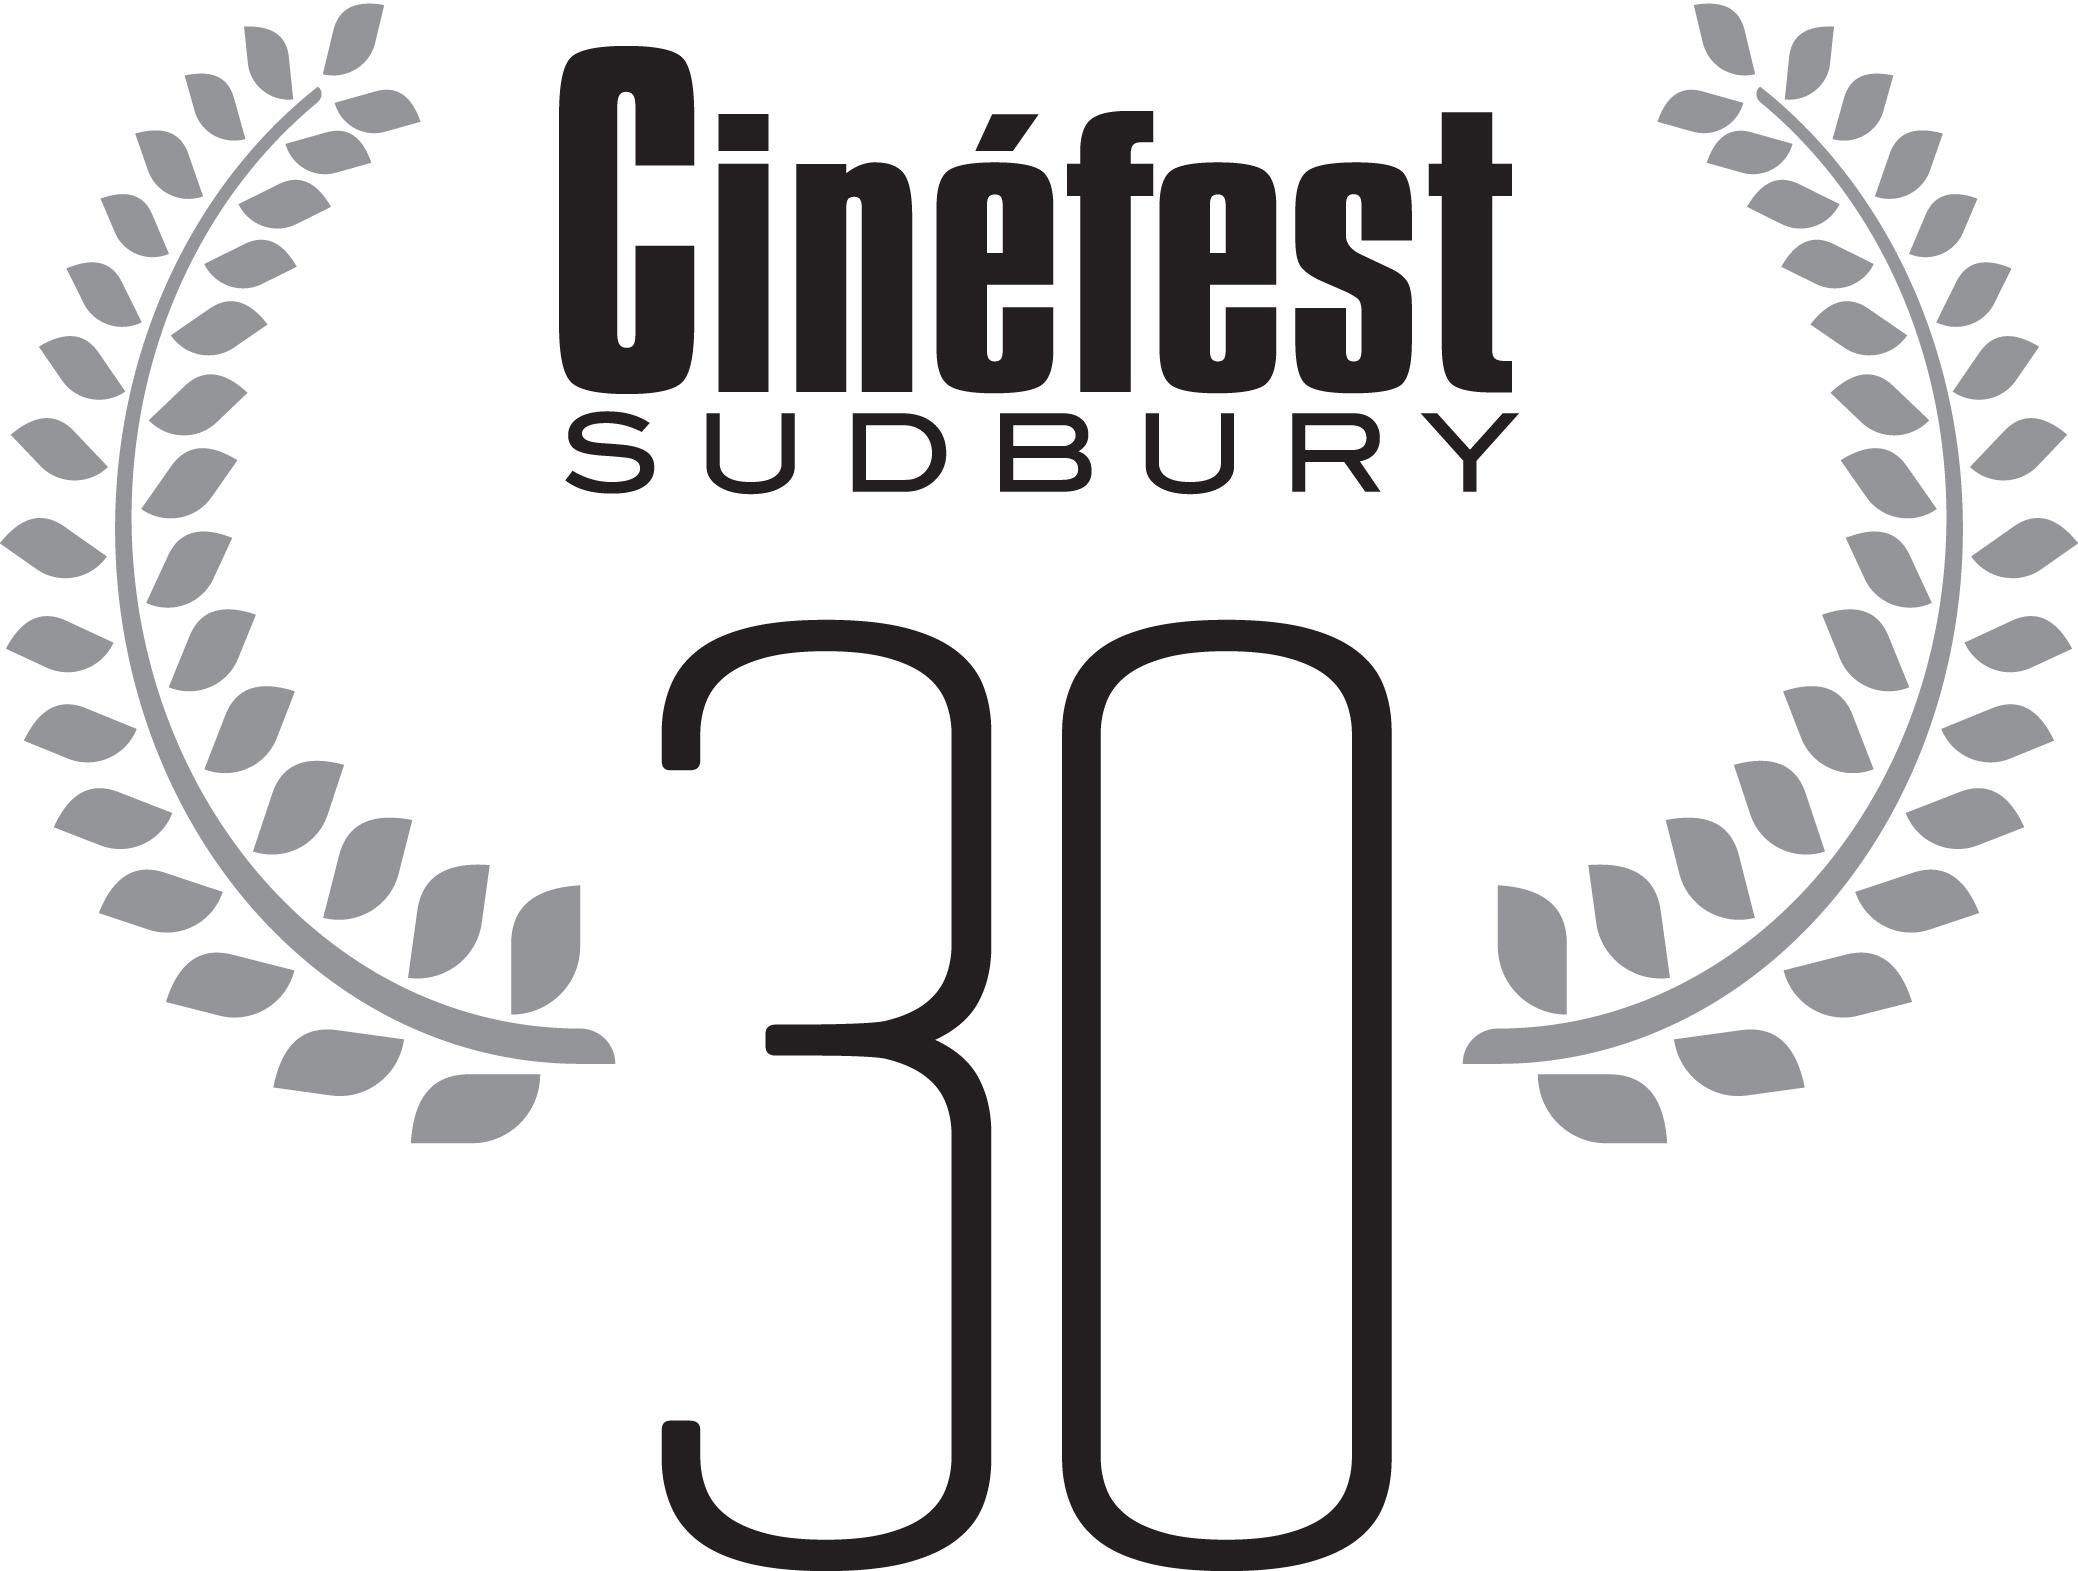 Cinéfest Sudbury Logo